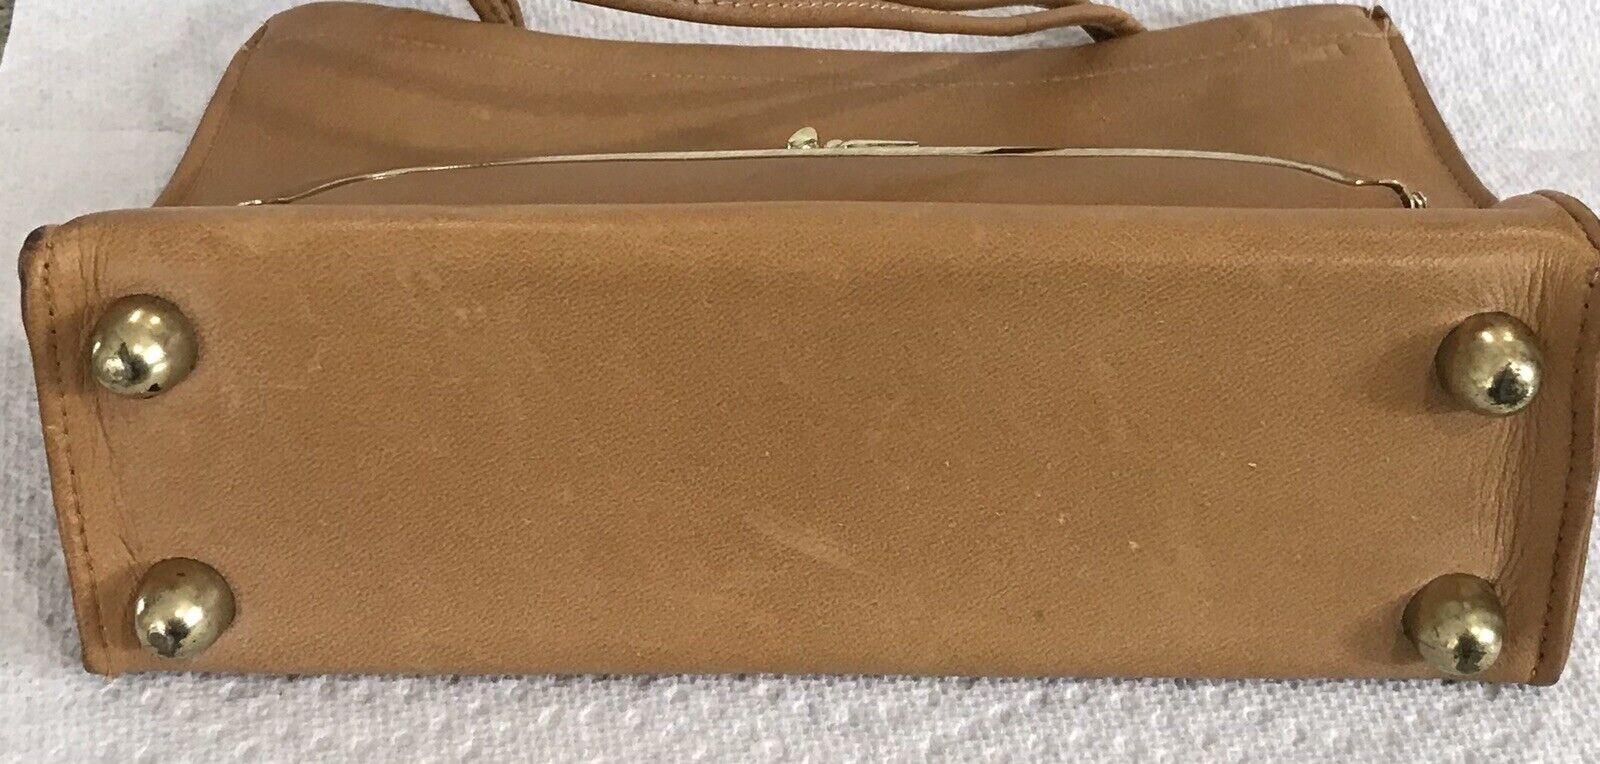 Vintage Coach Rare Leather Bonnie Cashin Stripe I… - image 6